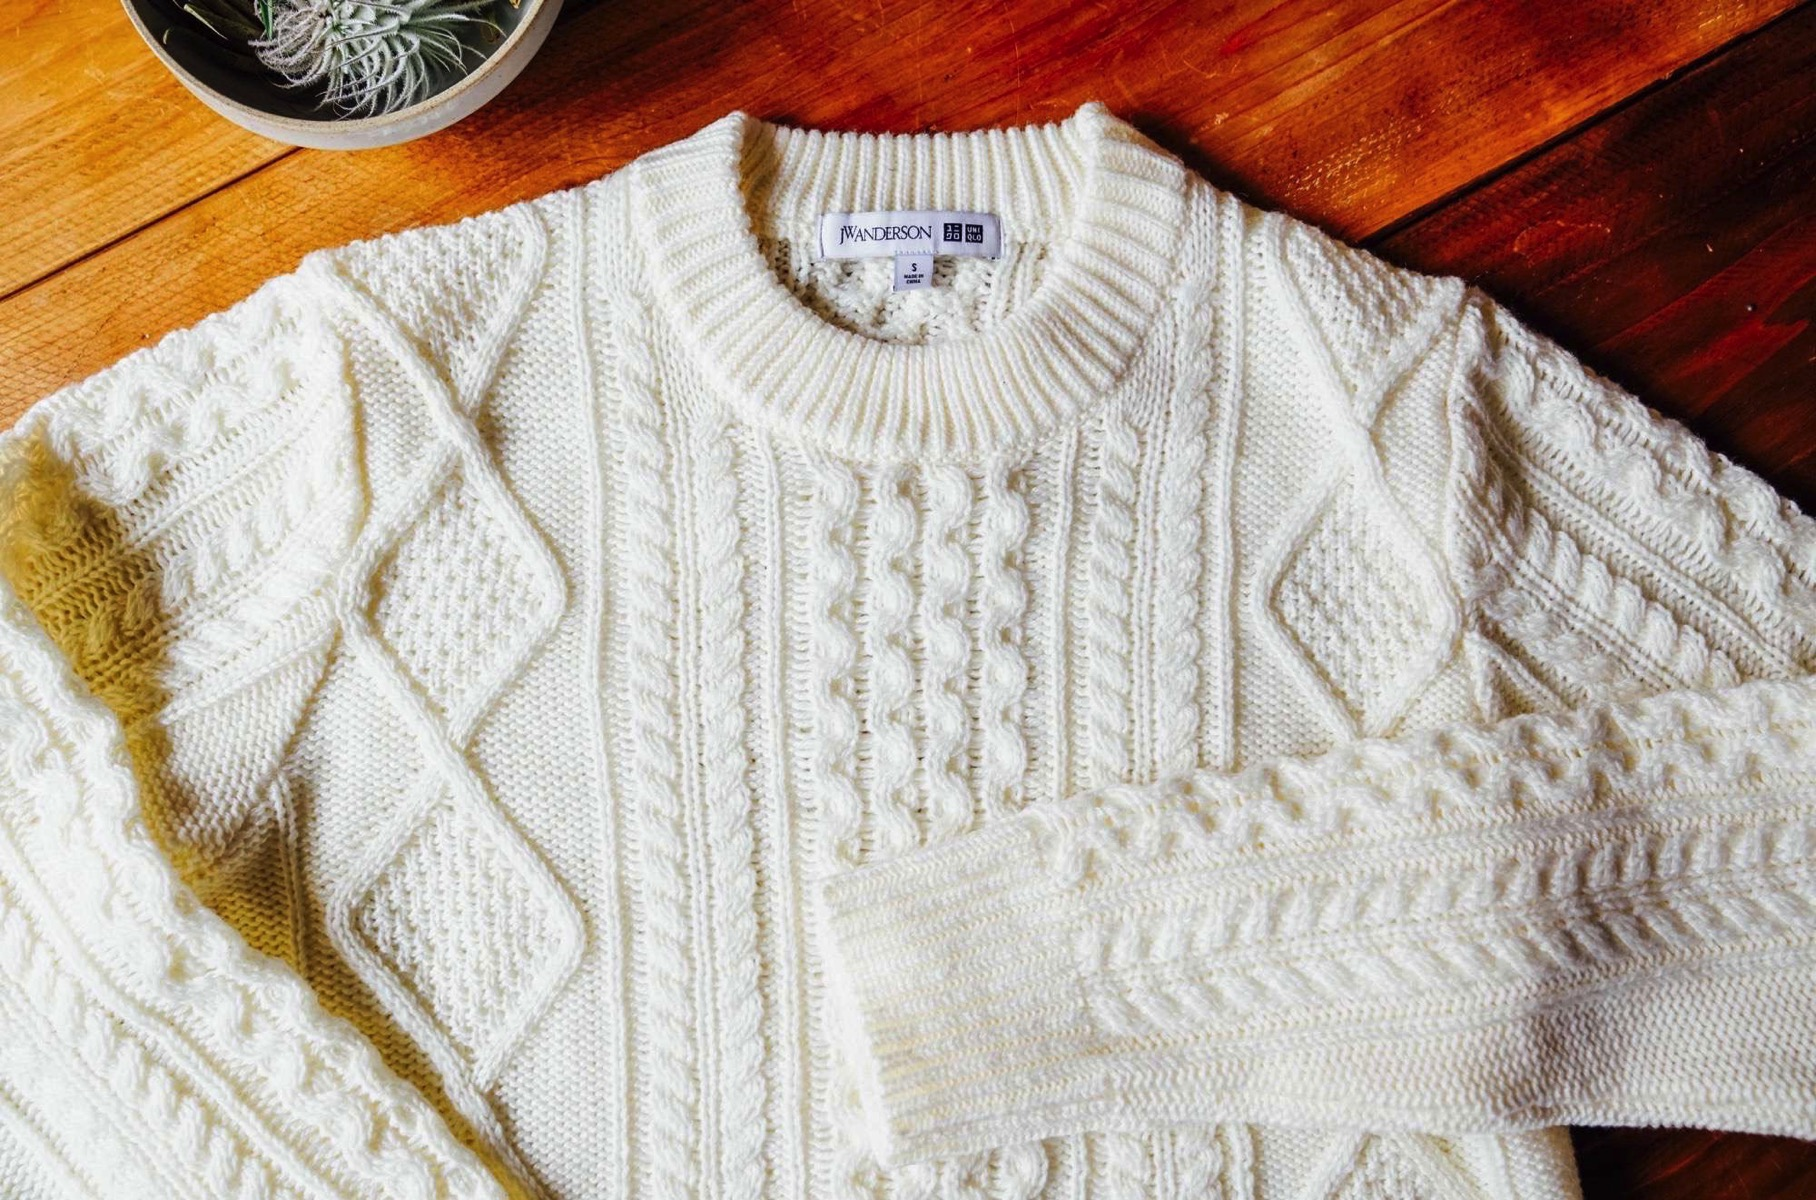 Uniqlo jw anderson wool 3